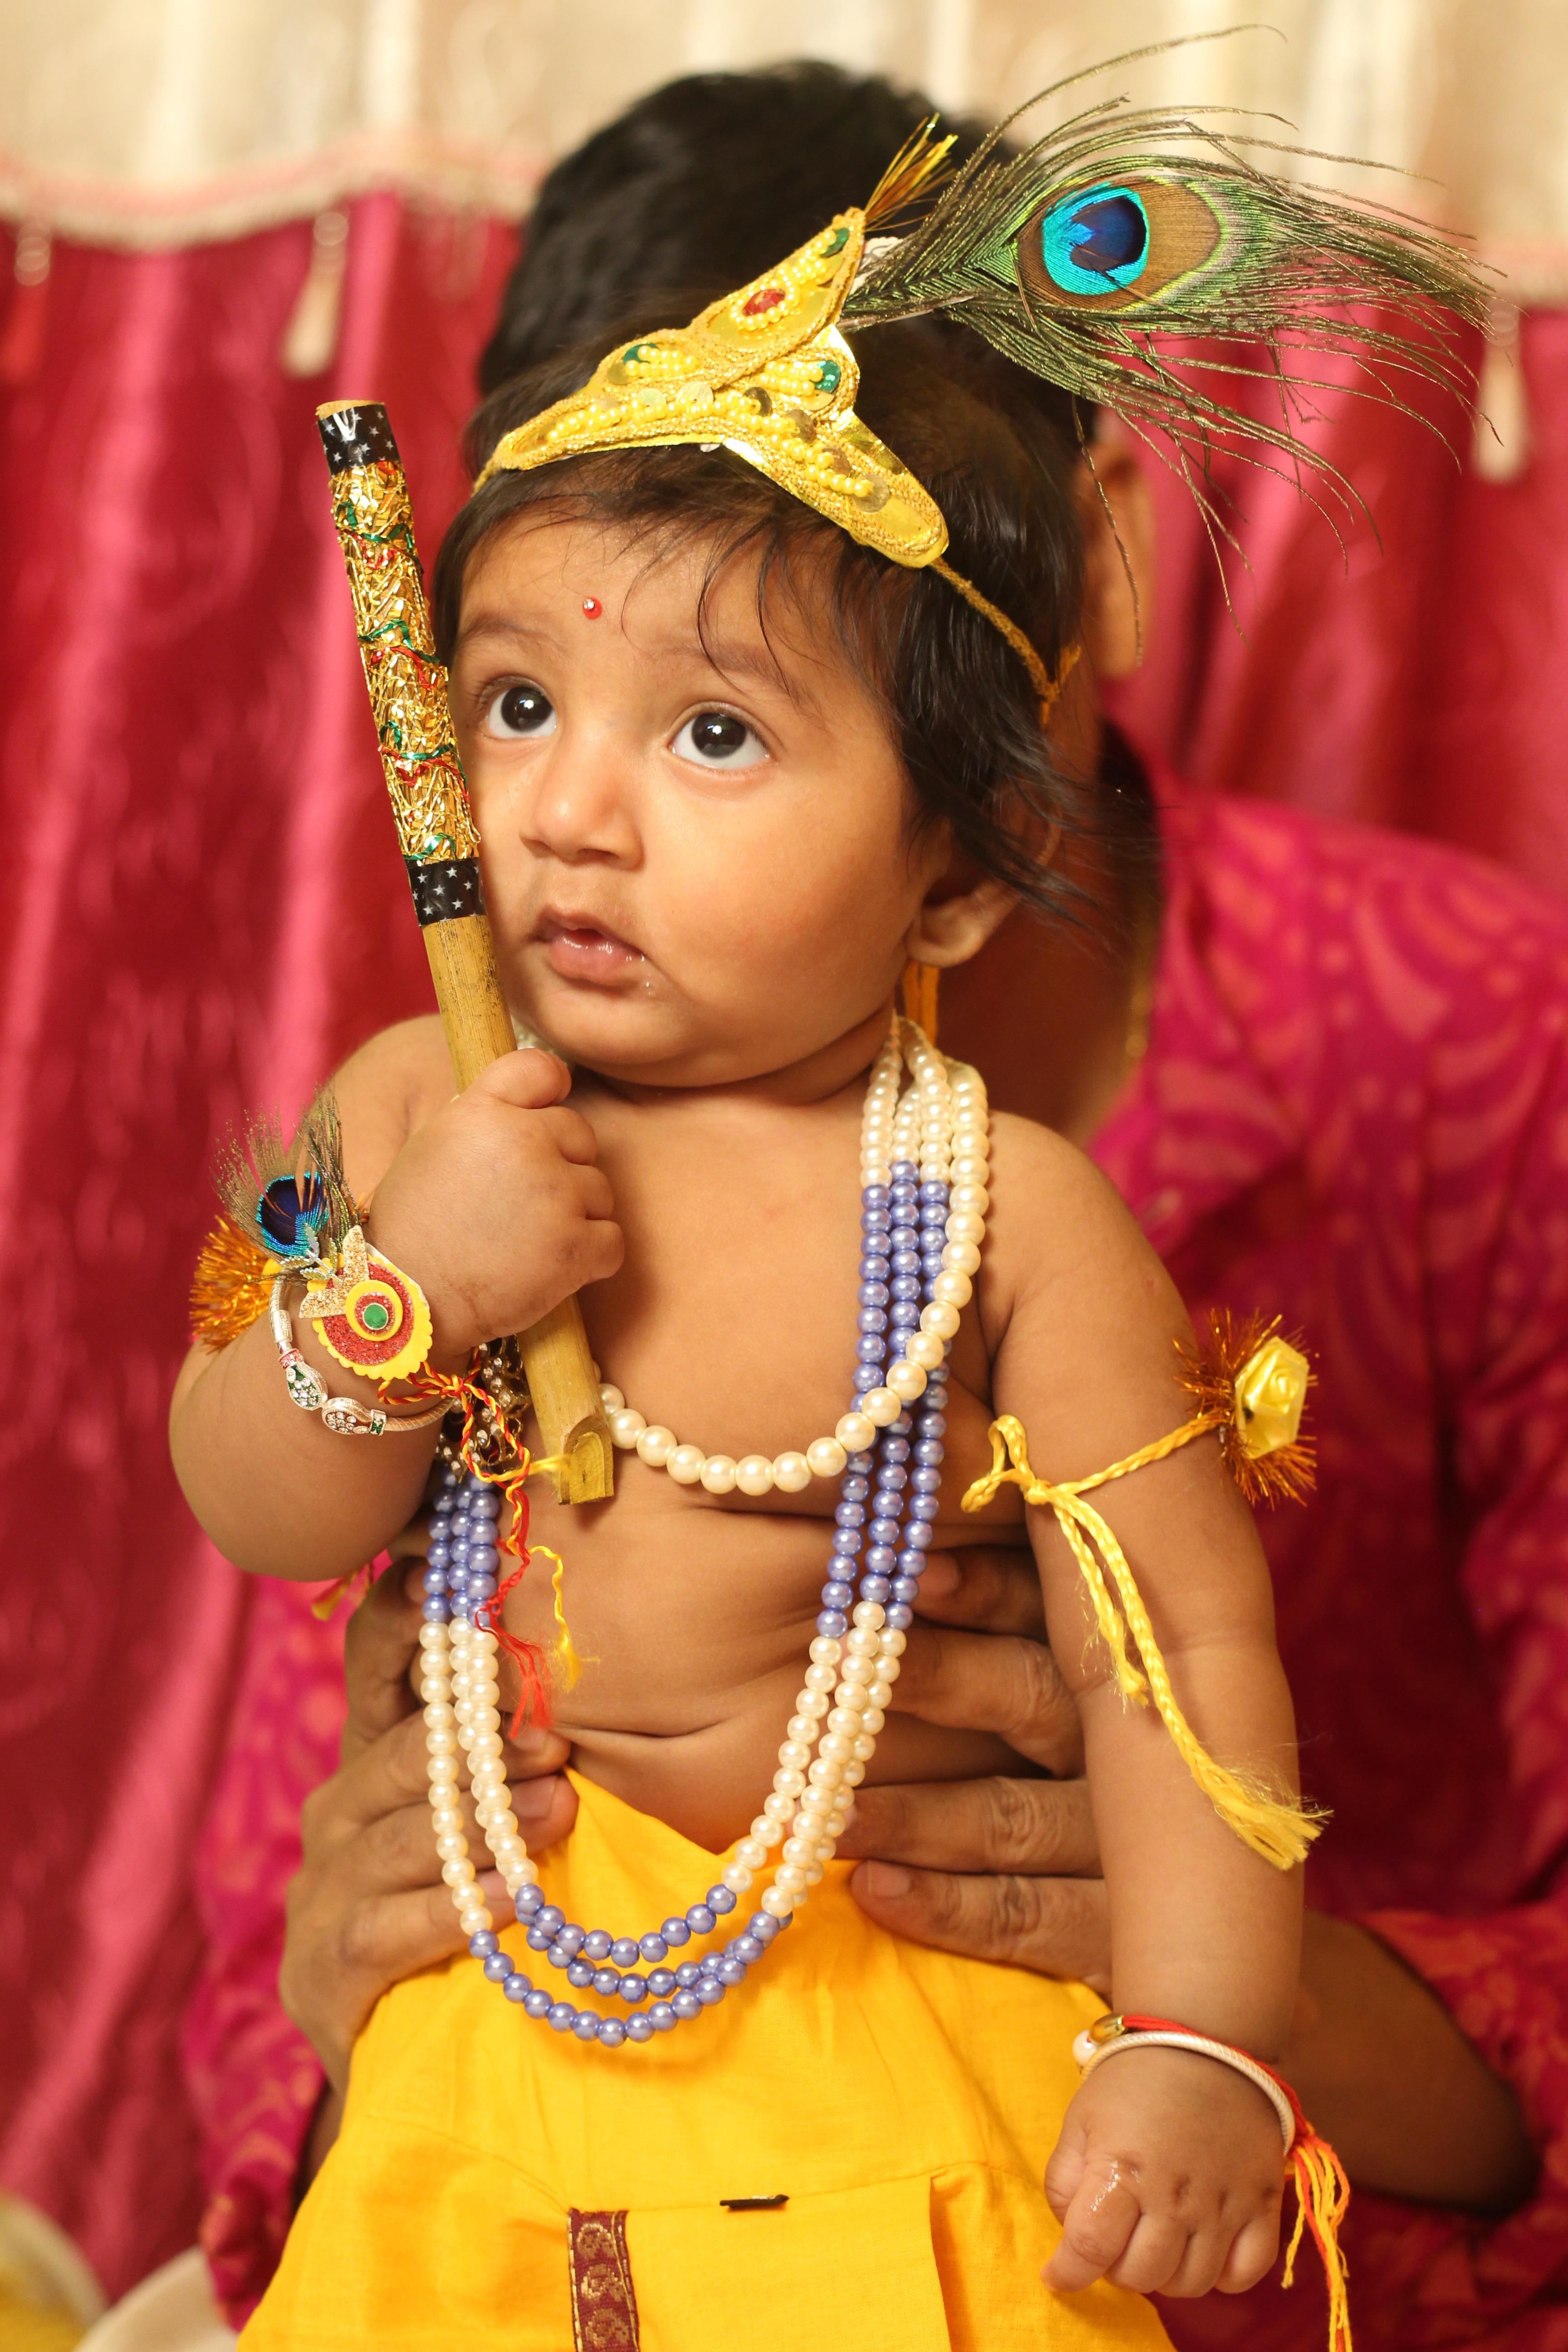 krishna look for boy